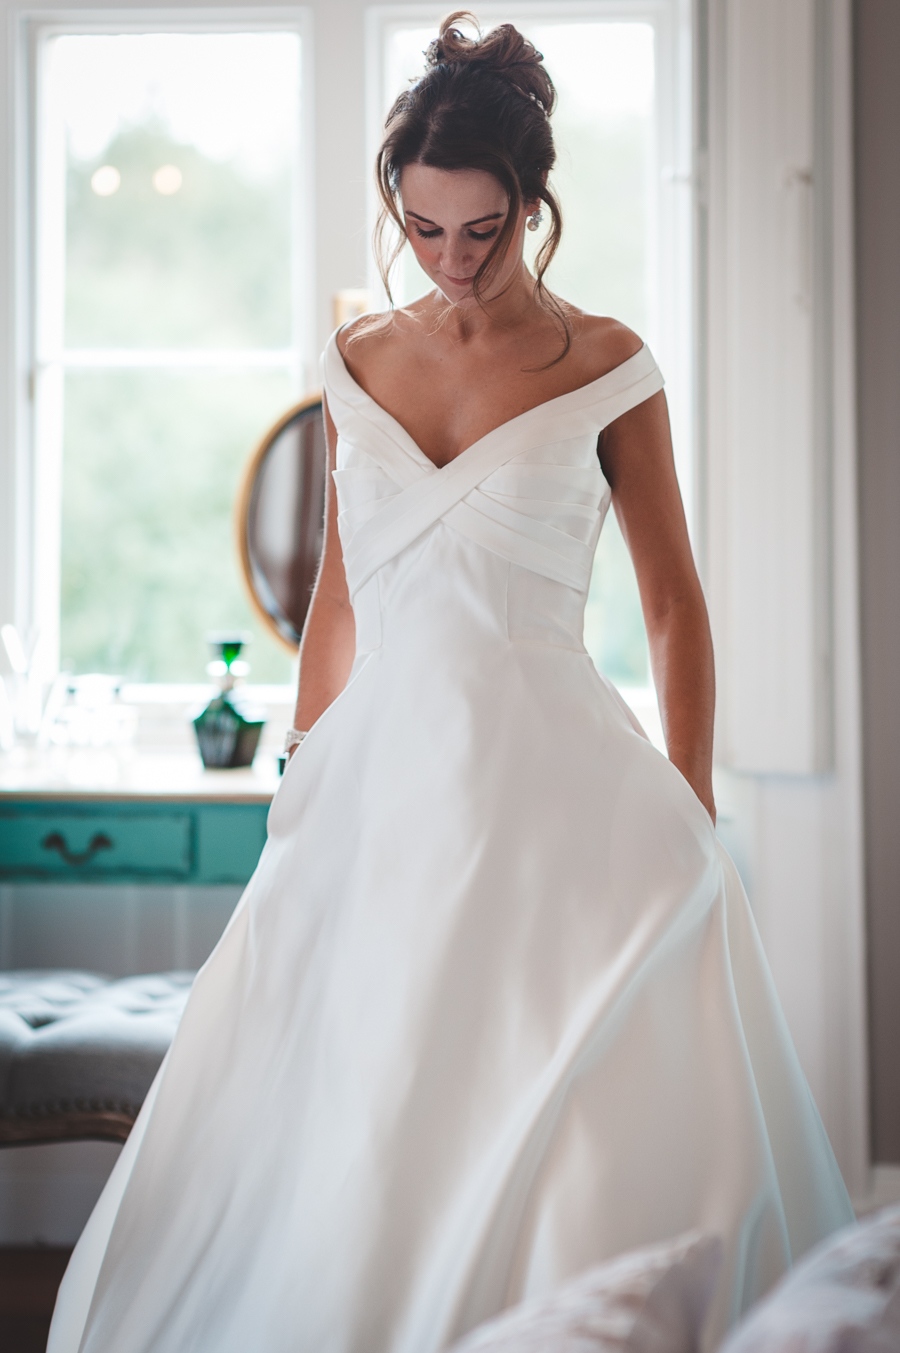 Yorkshire wedding venue styling ideas, photo credit Boho Chic Weddings (31)